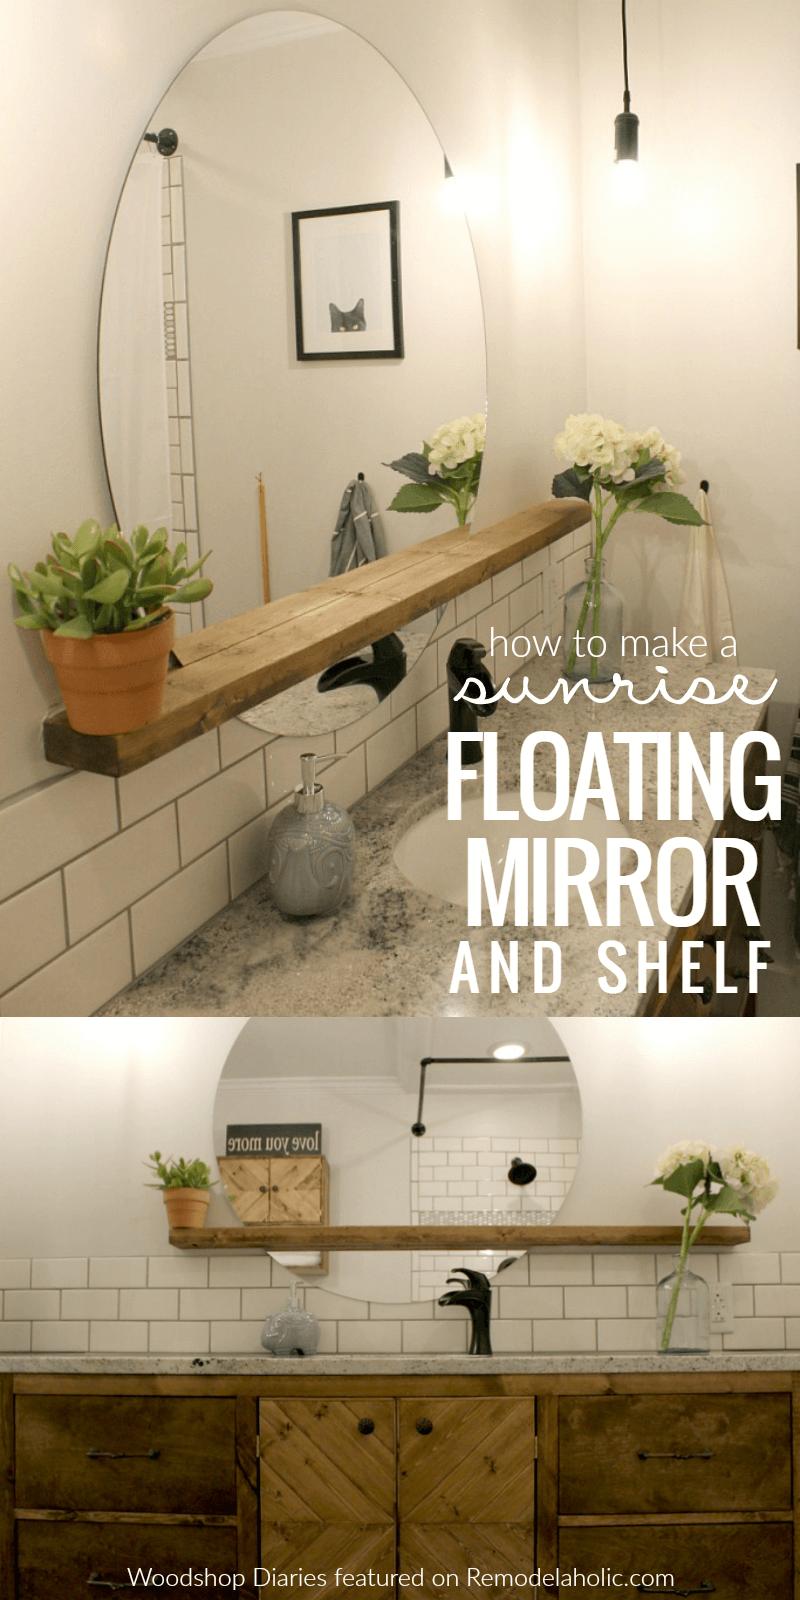 Luxury Lagoon Floating Mirror and Shelf